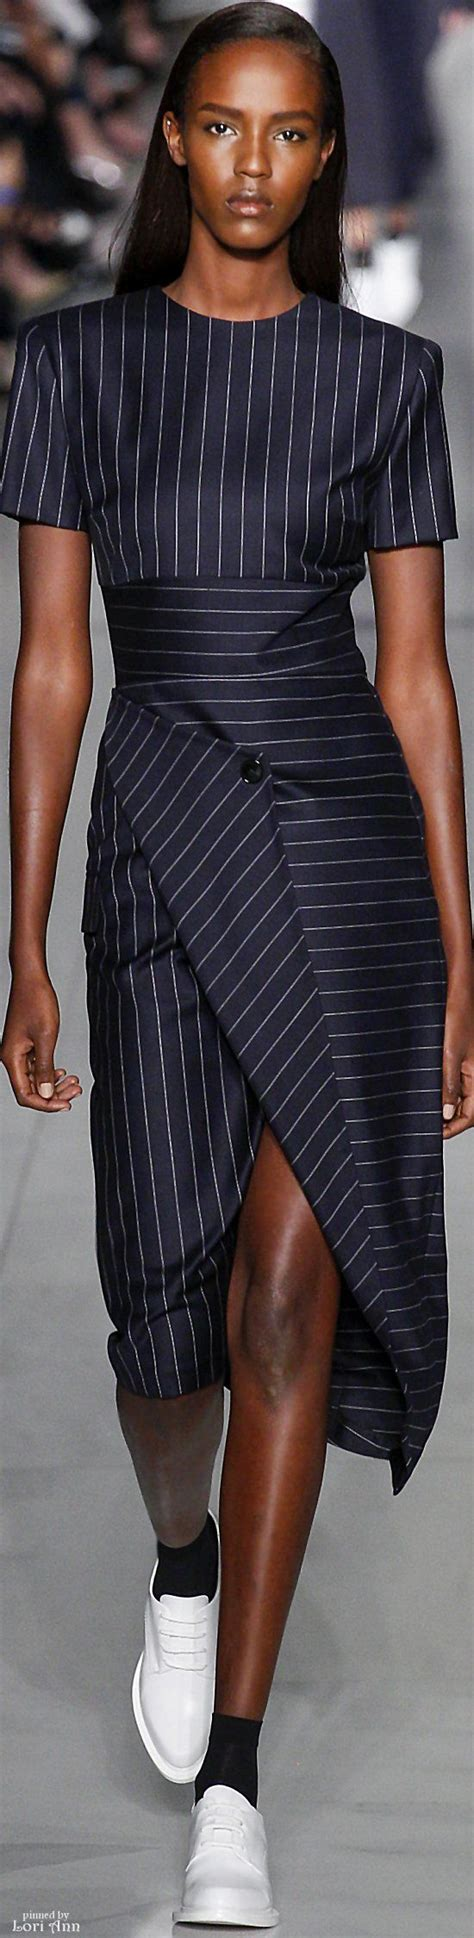 DKNY Spring 2016 RTW | Fashion, Fashion clothes women ...